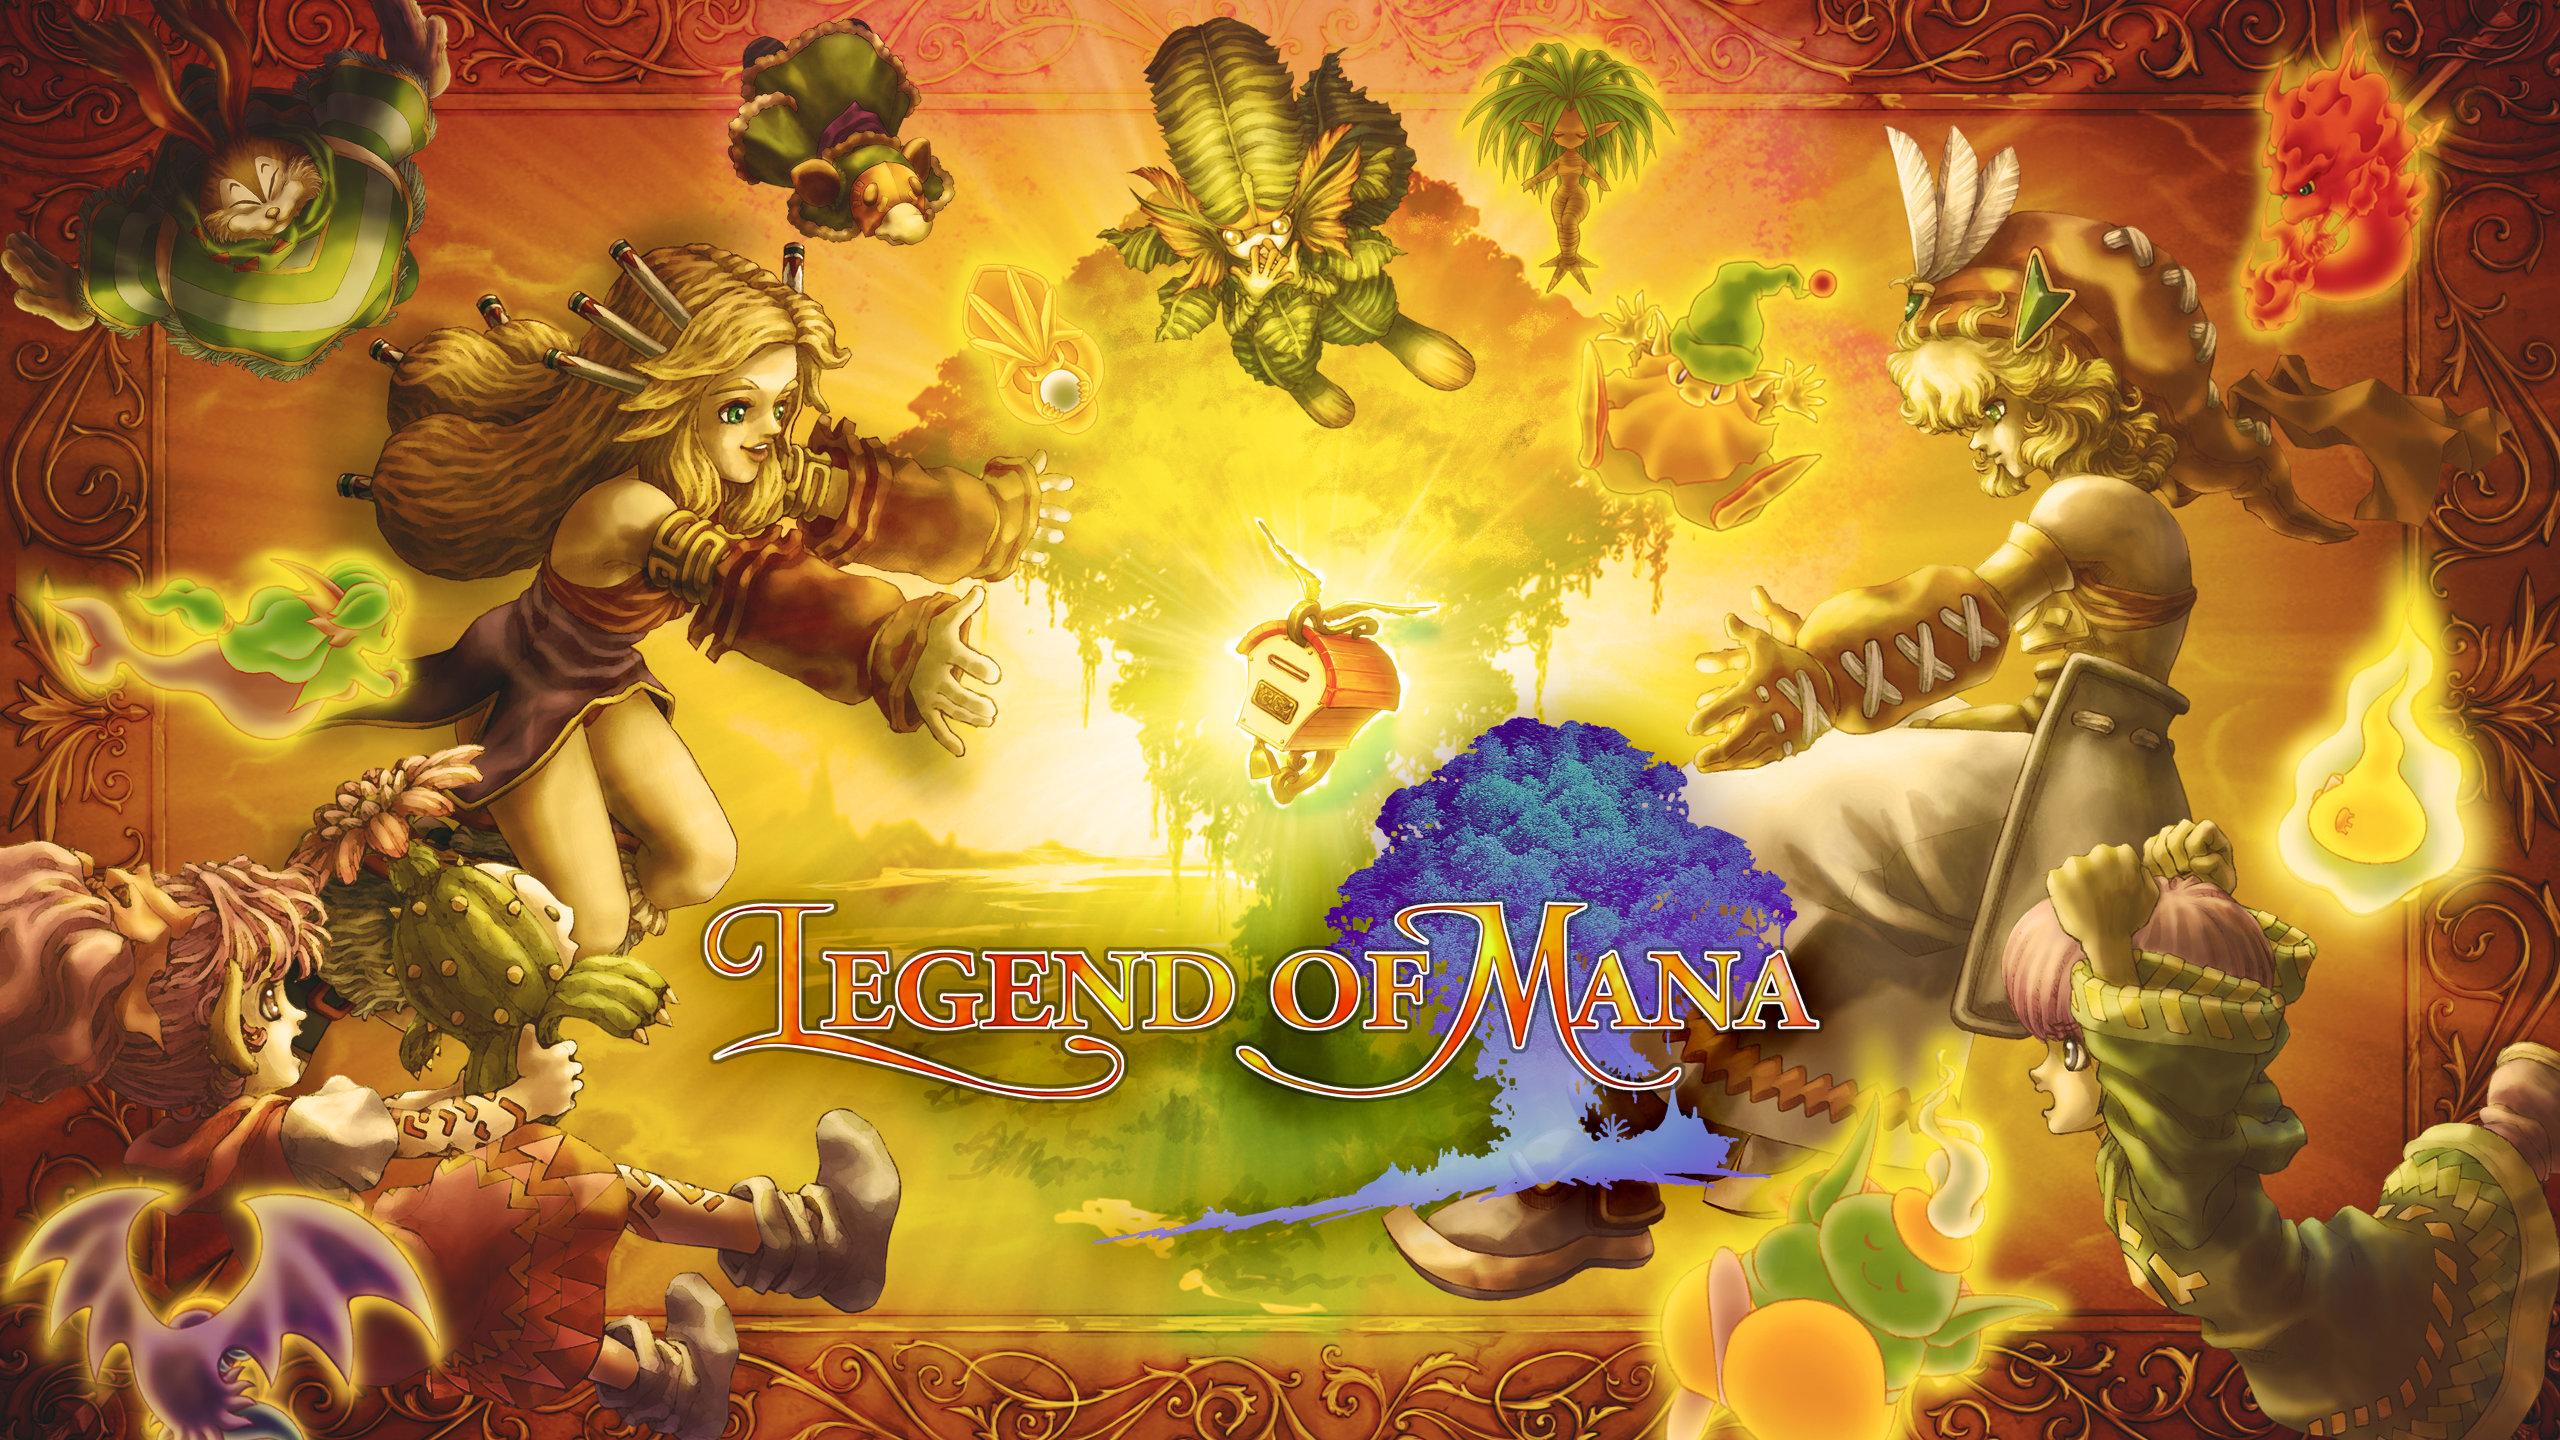 Artwork for Legend of Mana Remaster